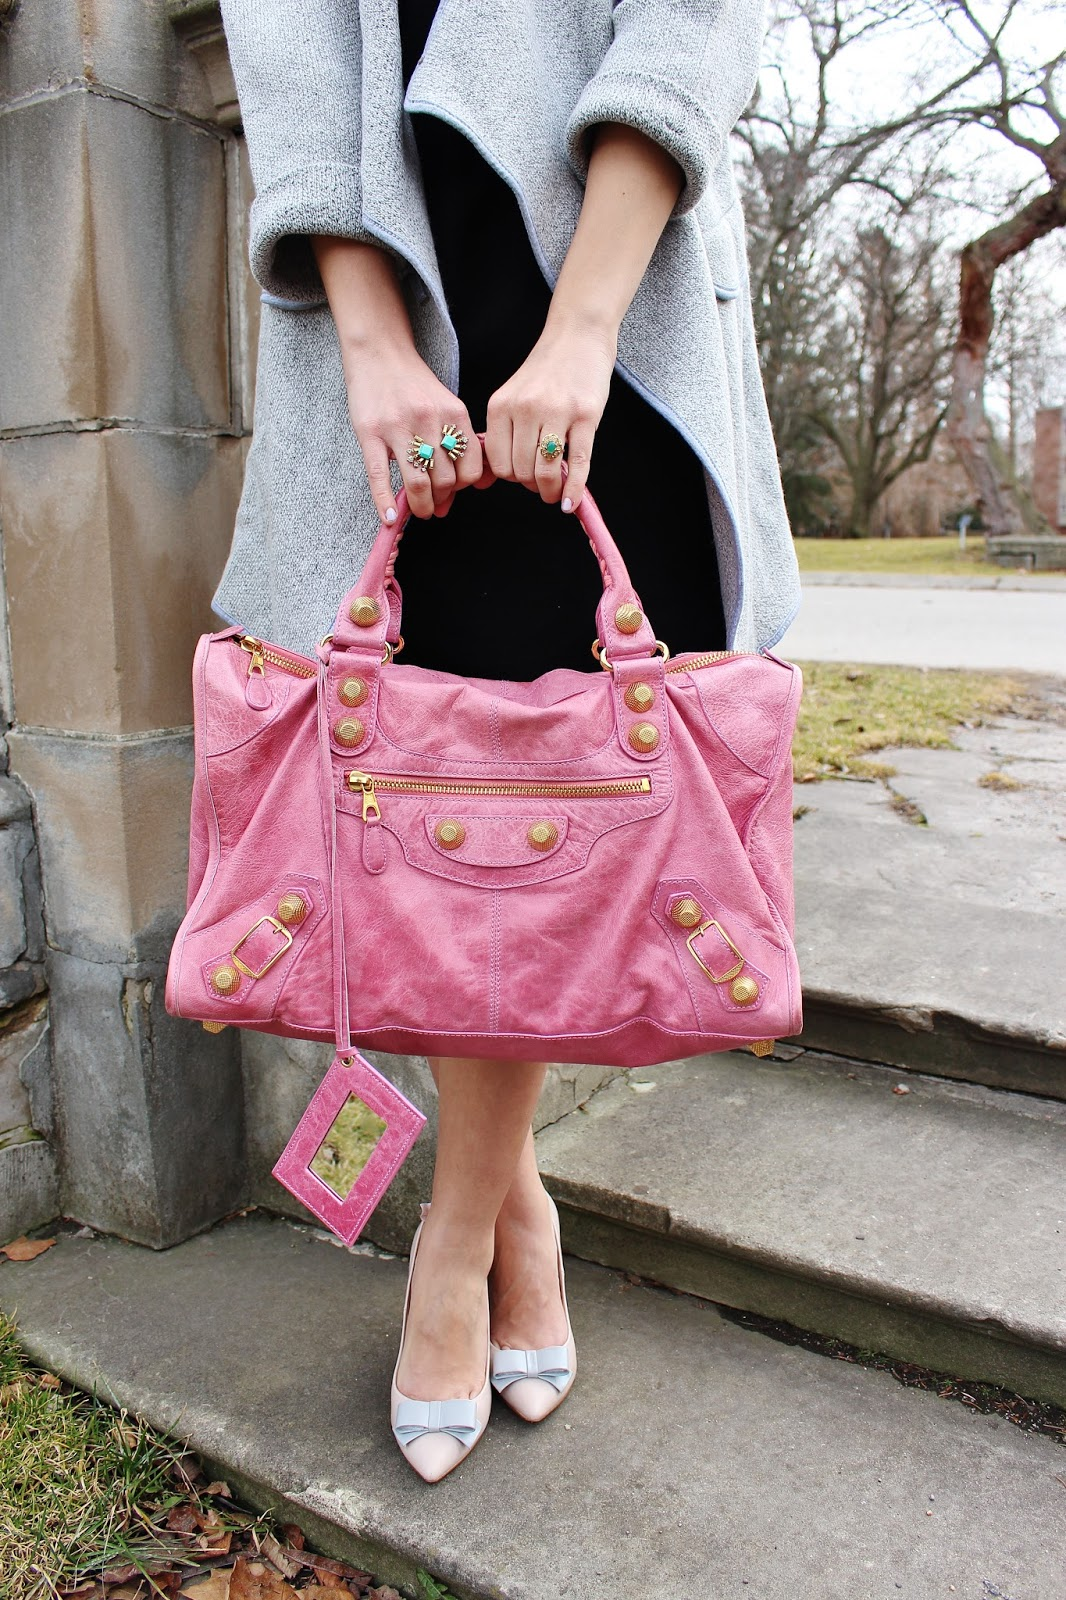 bijuleni-balenciaga town giant handbag